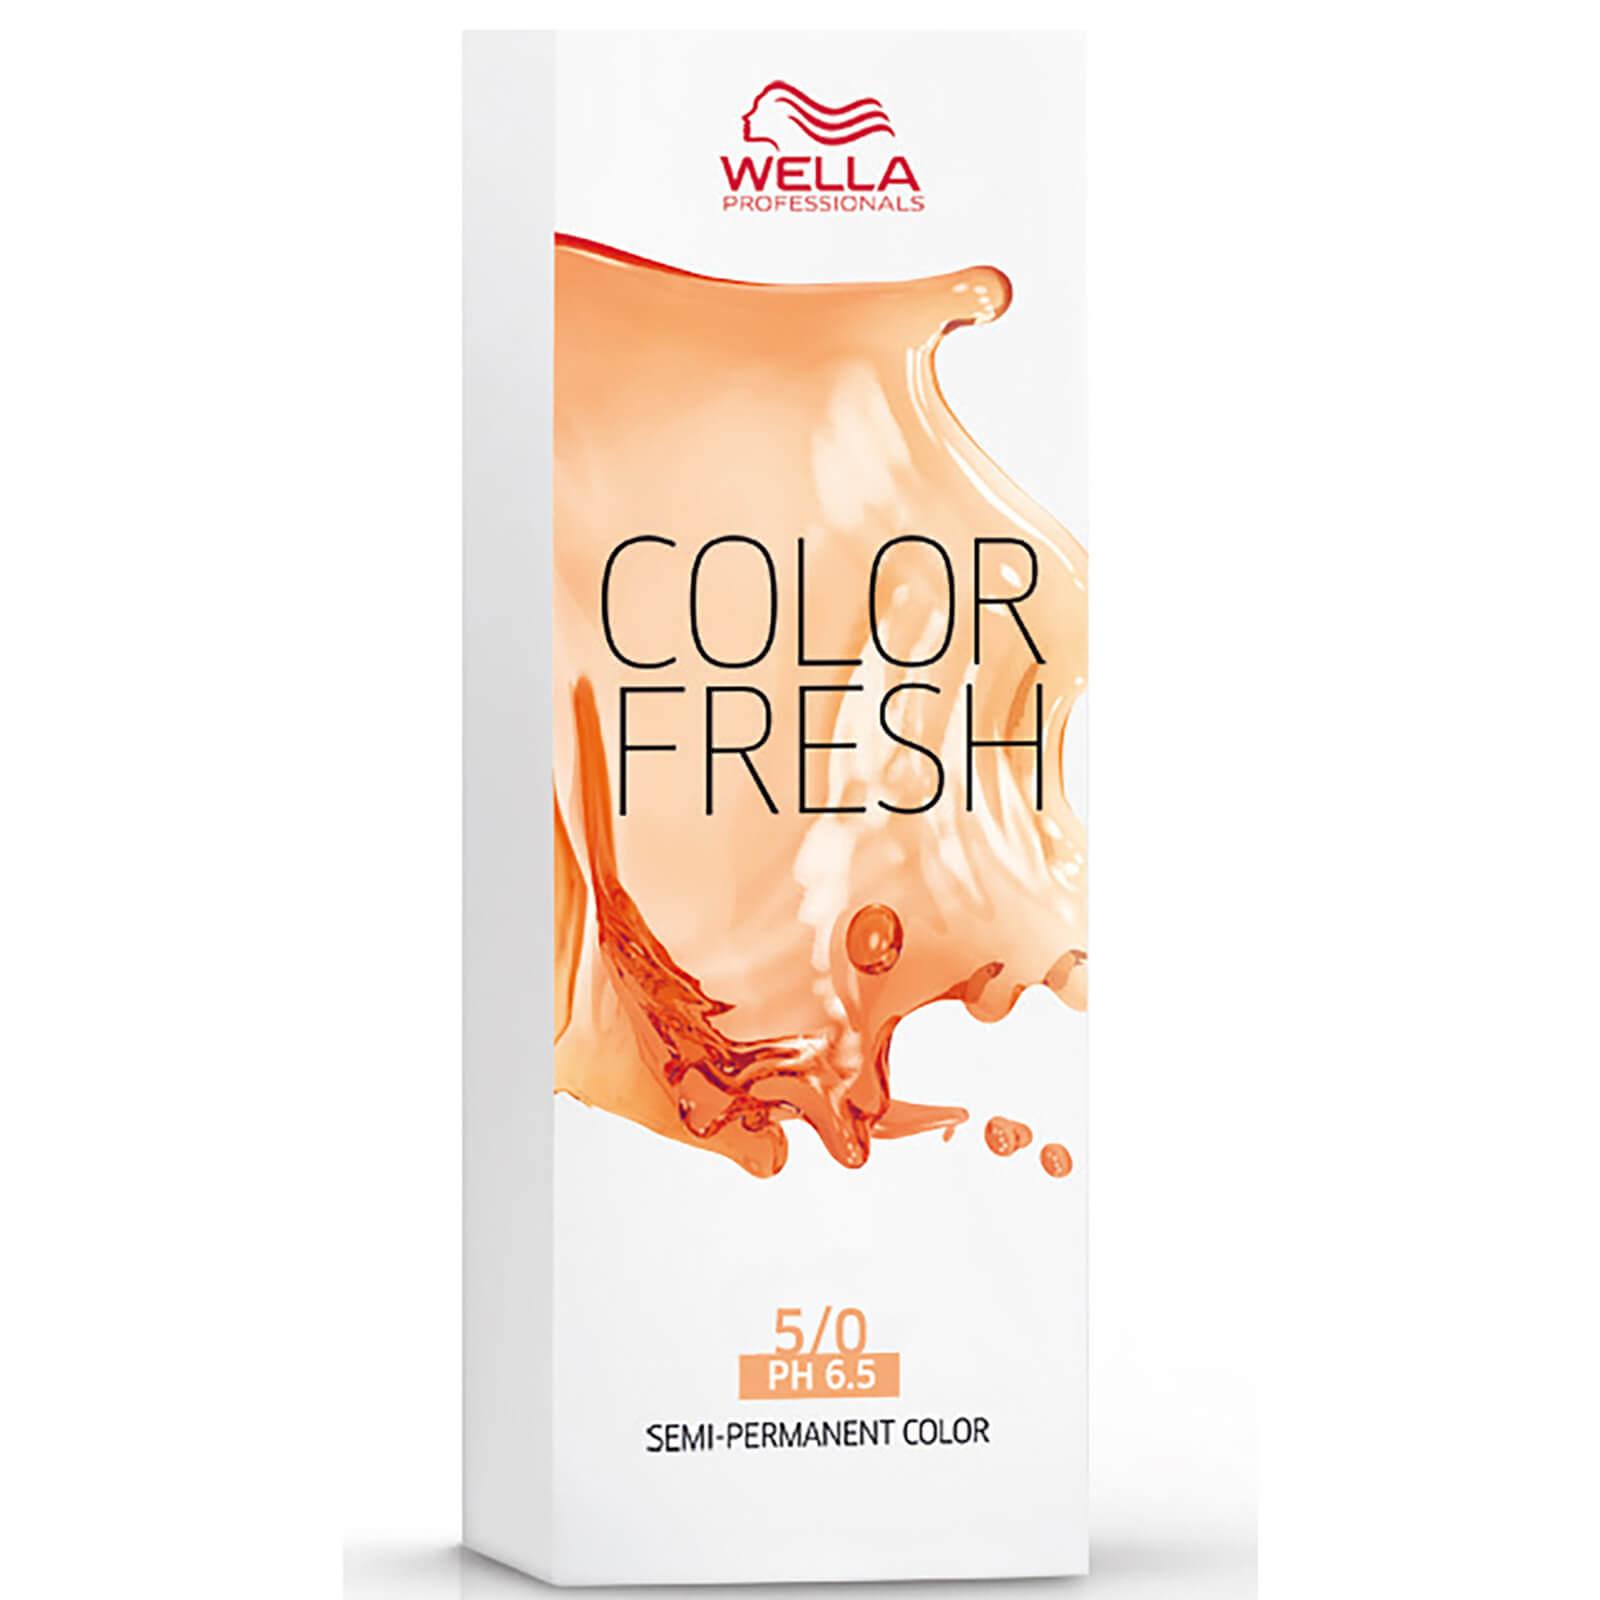 Wella Color Freshchâtain clair Wella5/07 (75 ml)